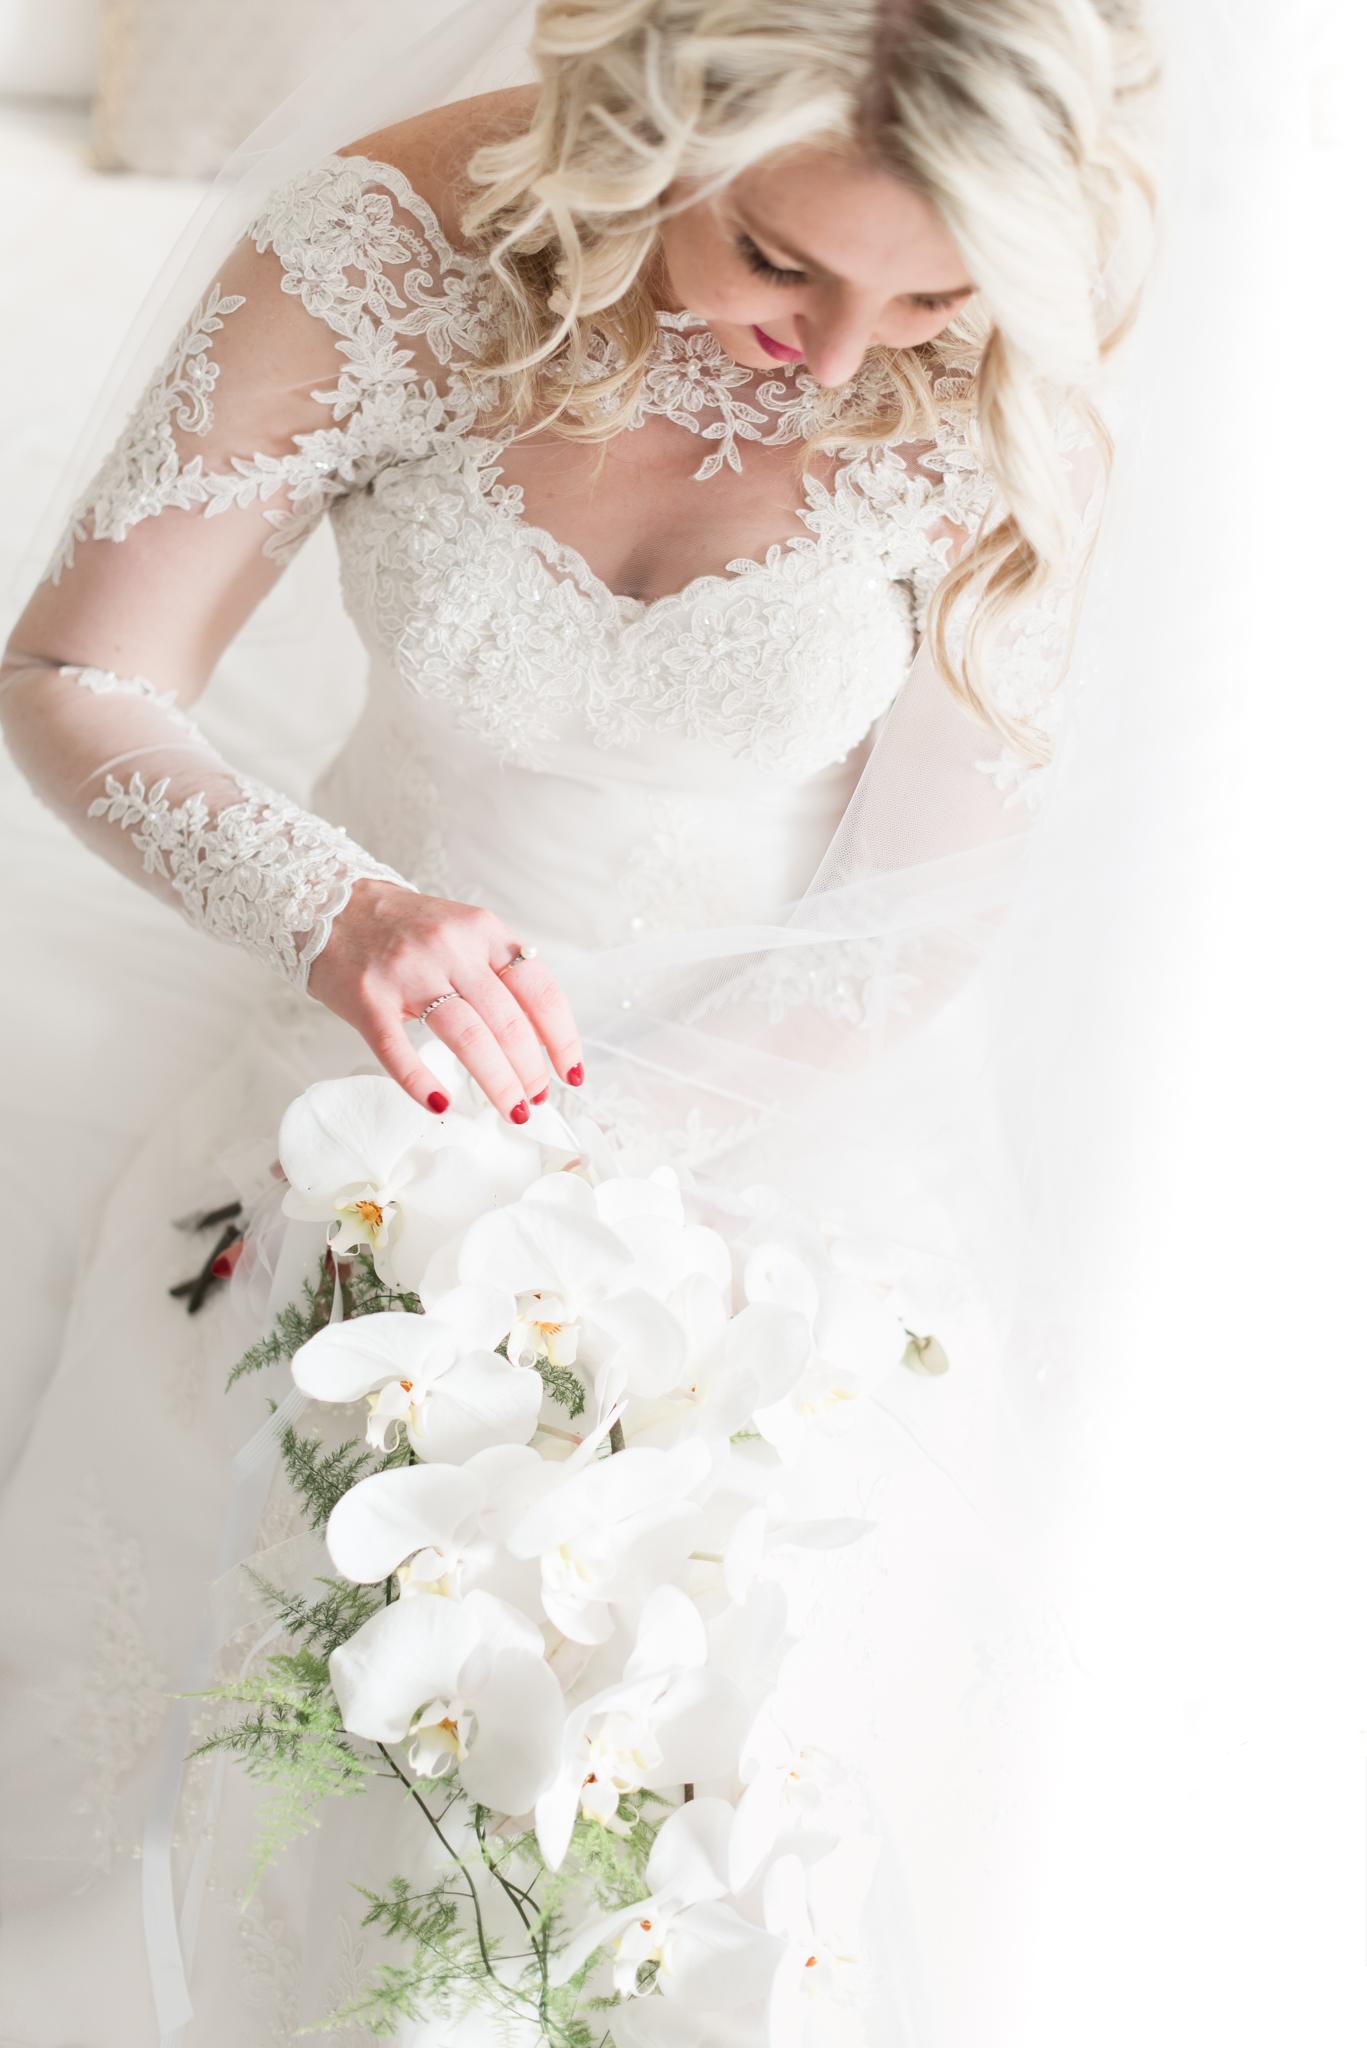 Angelique_Smith_Photography_Pieter&Yvonne_Wedding-128.jpg